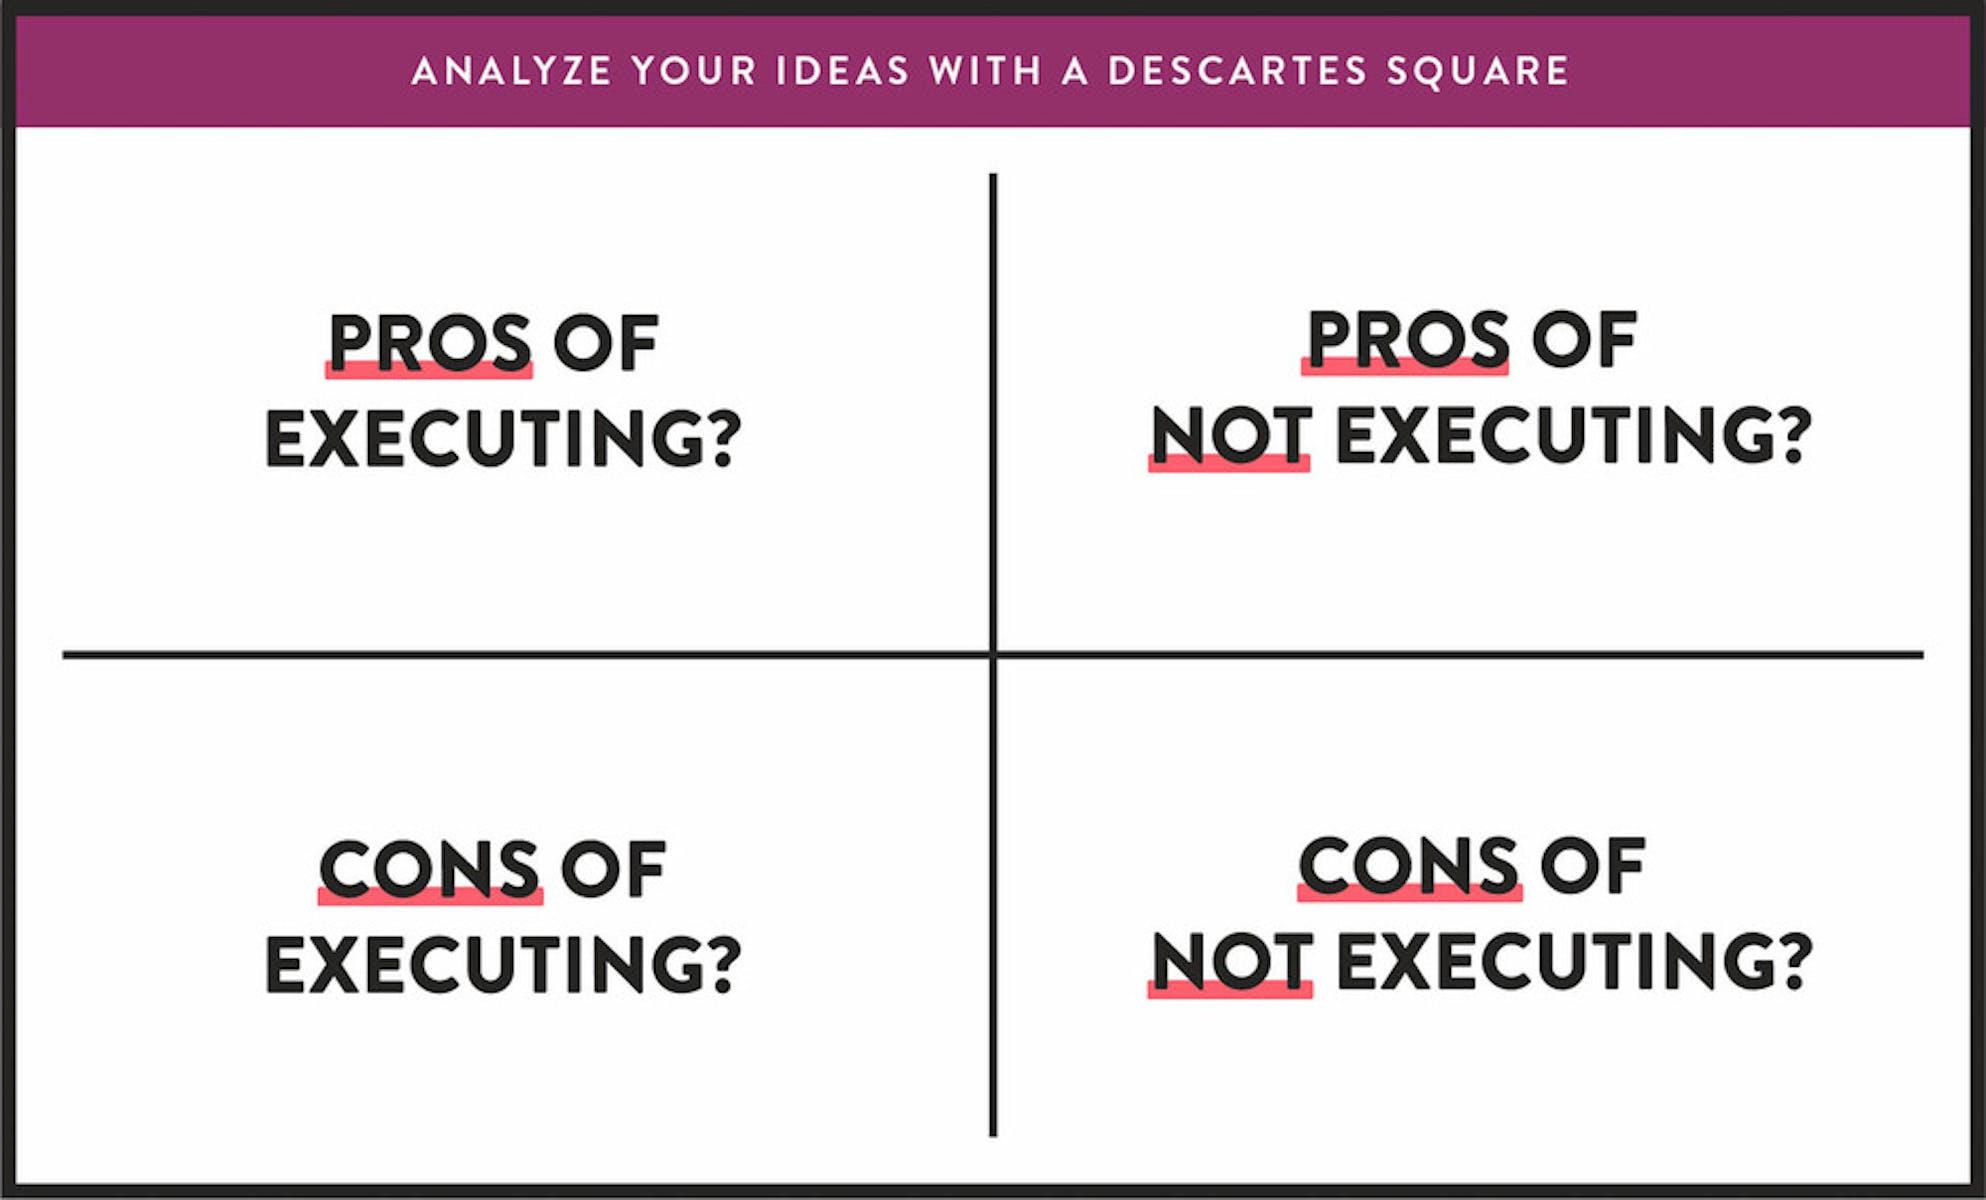 Analyze your ideas with a descartes square and achieve success